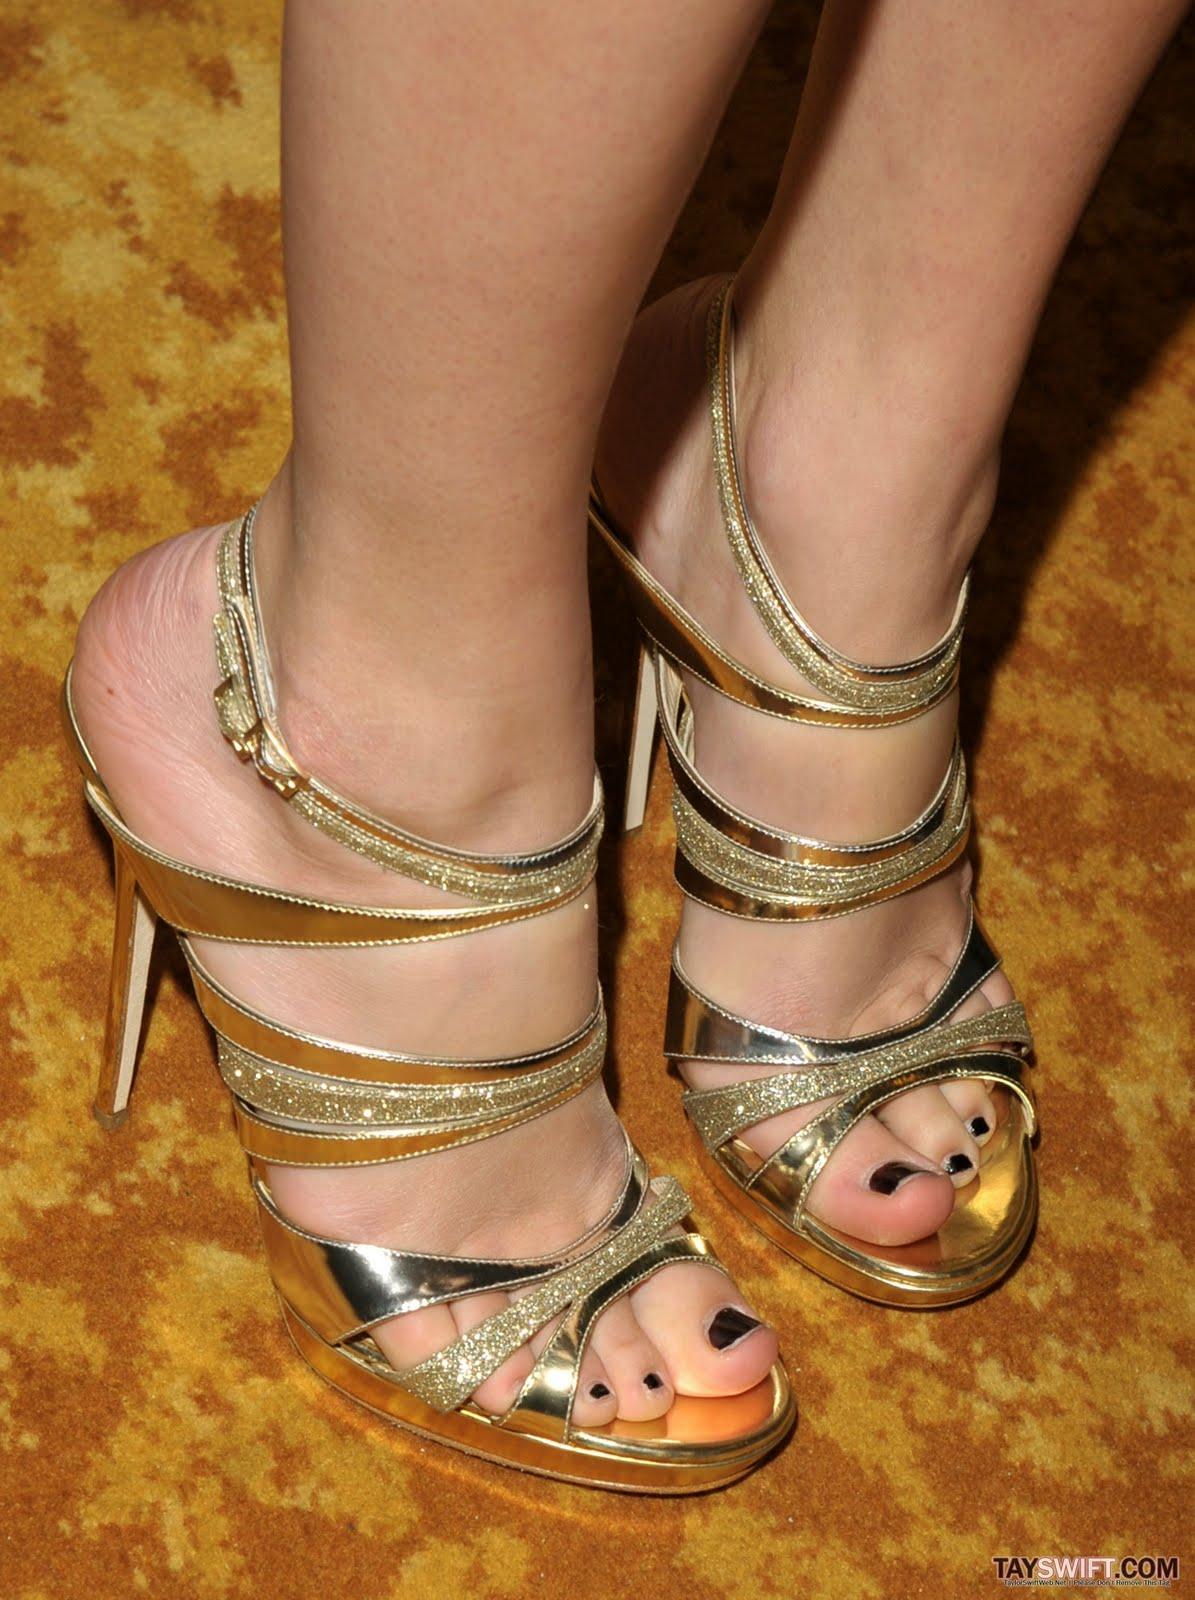 http://3.bp.blogspot.com/_N2u0bdQDNIg/TMJs05NH3VI/AAAAAAAABWs/8Vo_kzppEpQ/s1600/Taylor-Swift-Feet-149479.jpg